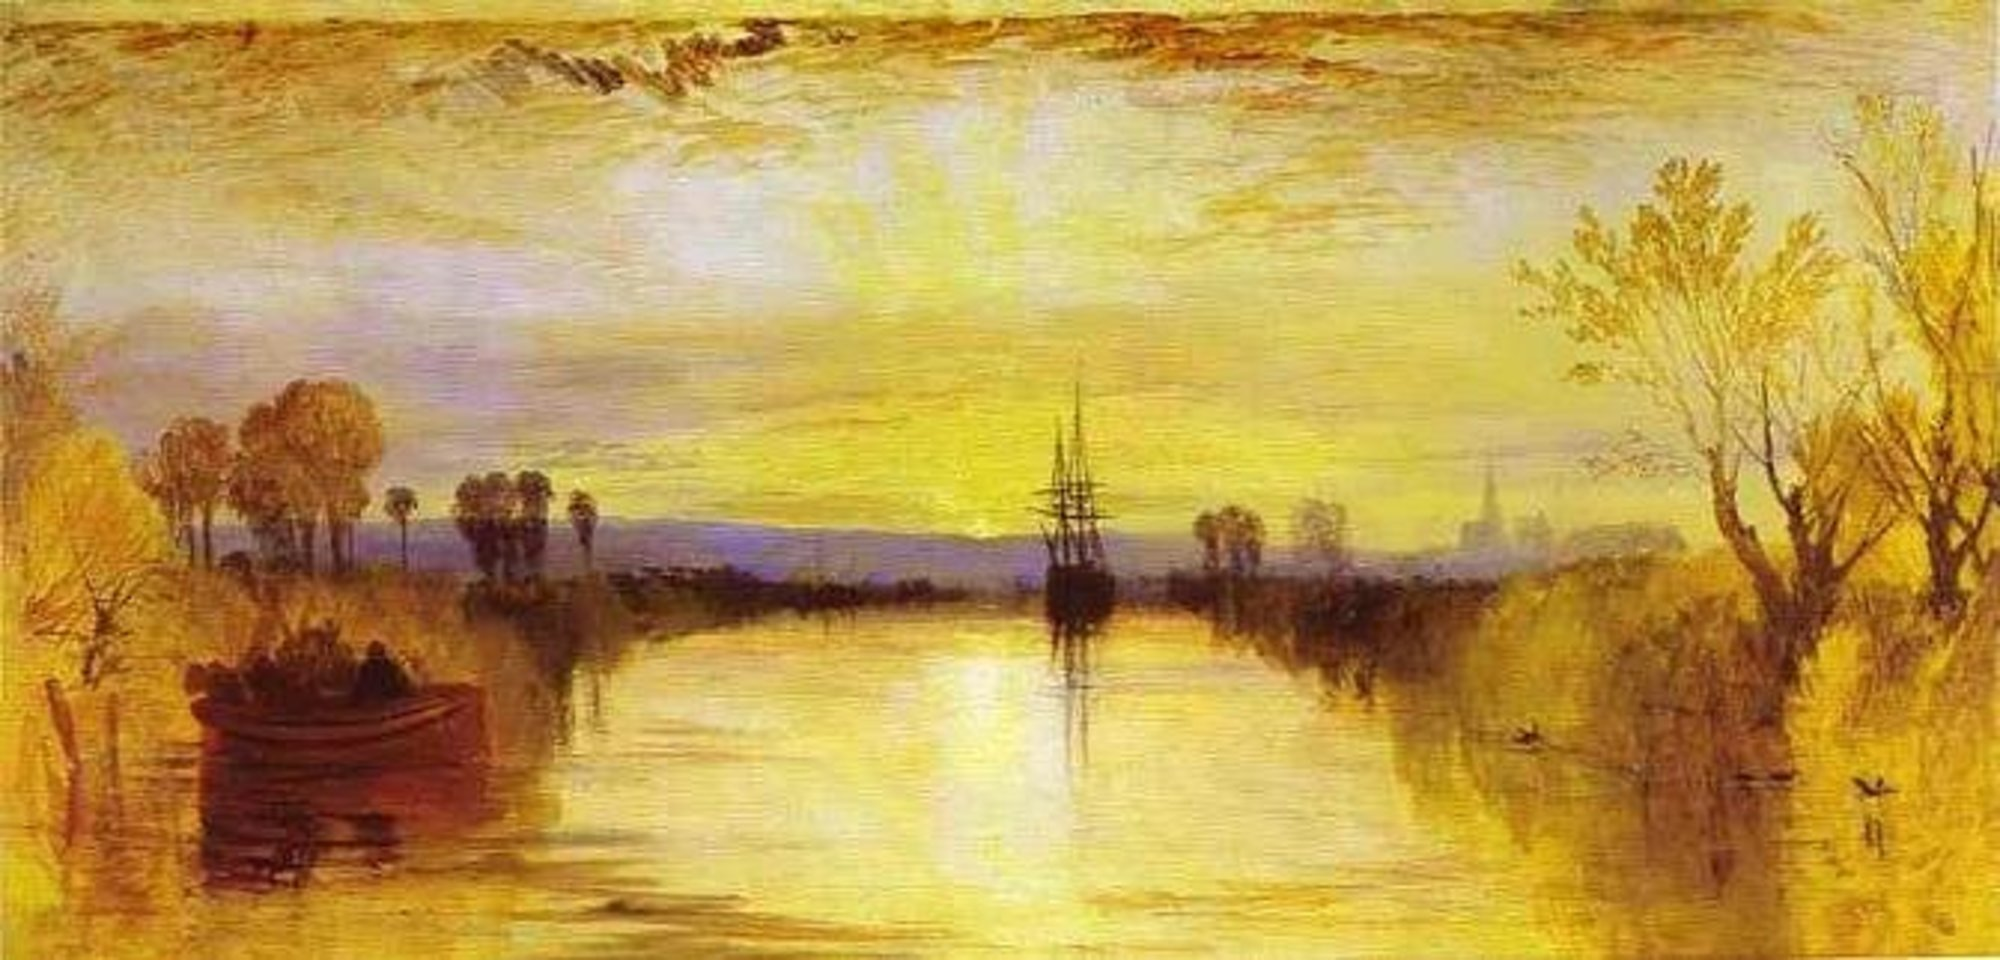 картина < канал в Чичестере >:: Уильям Тёрнер ( William Turner ) - Тёрнер Уйльям фото